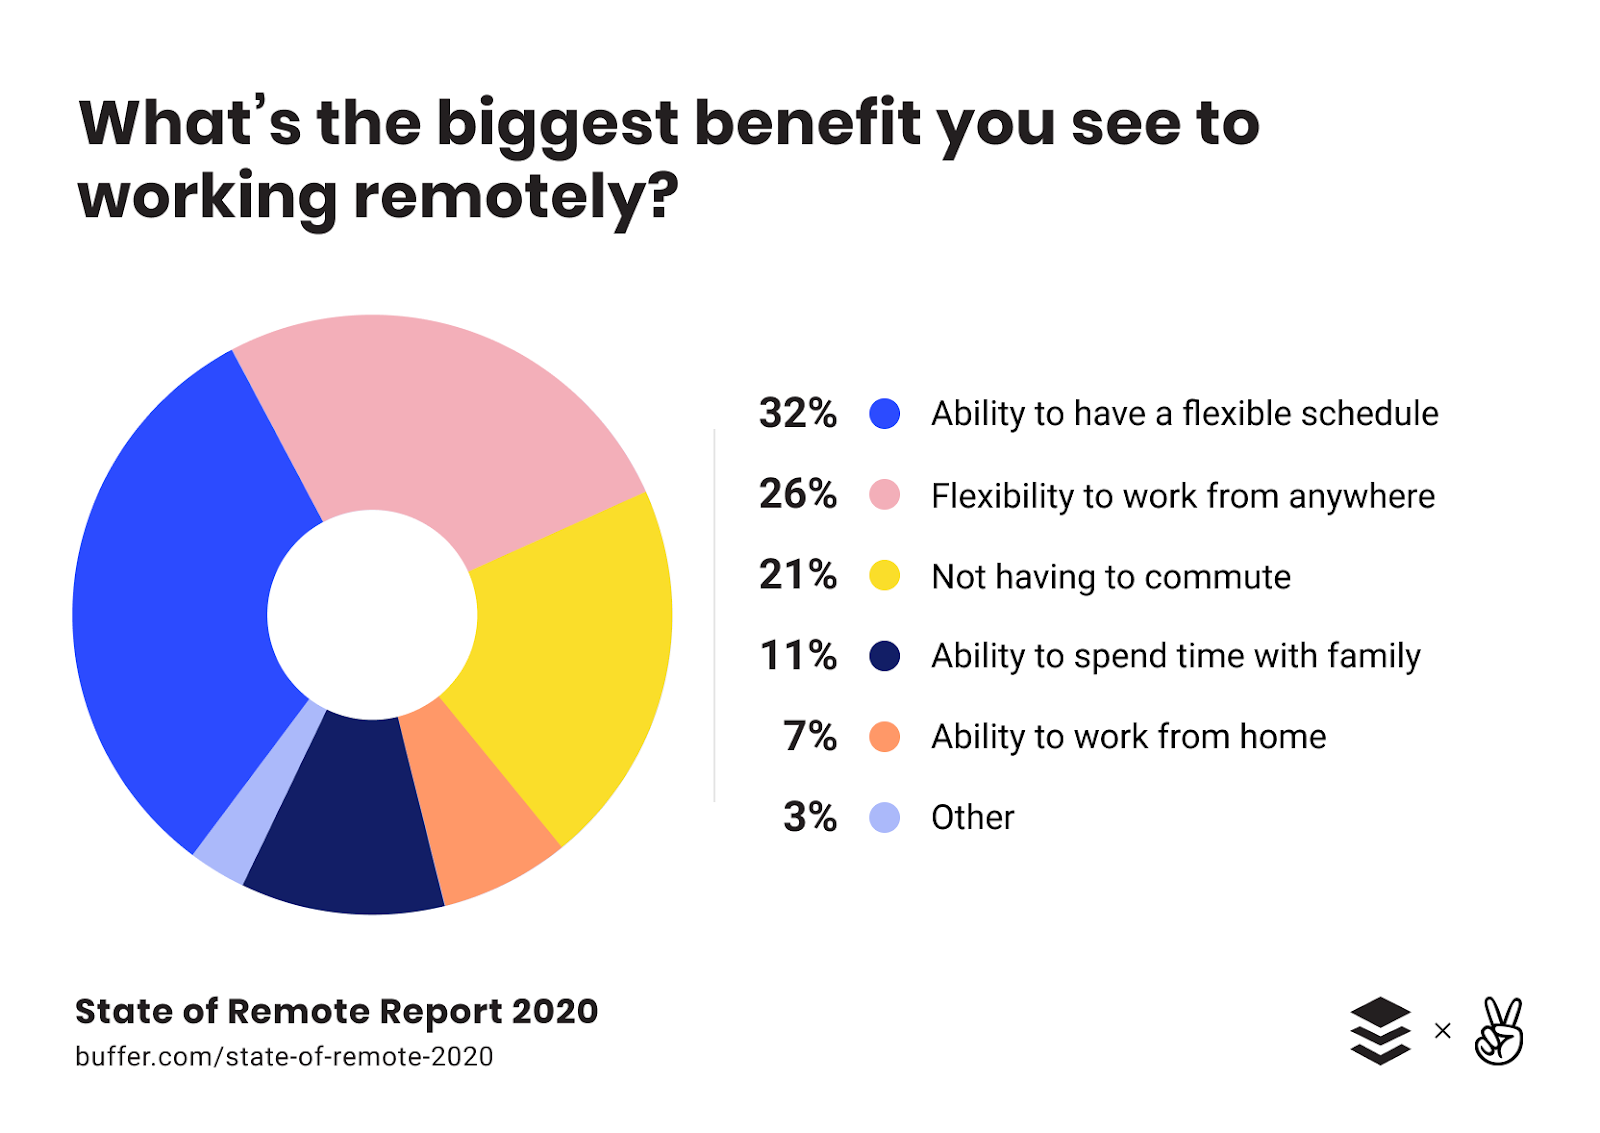 Flexible Schedule Is Biggest Remote Work Benefit